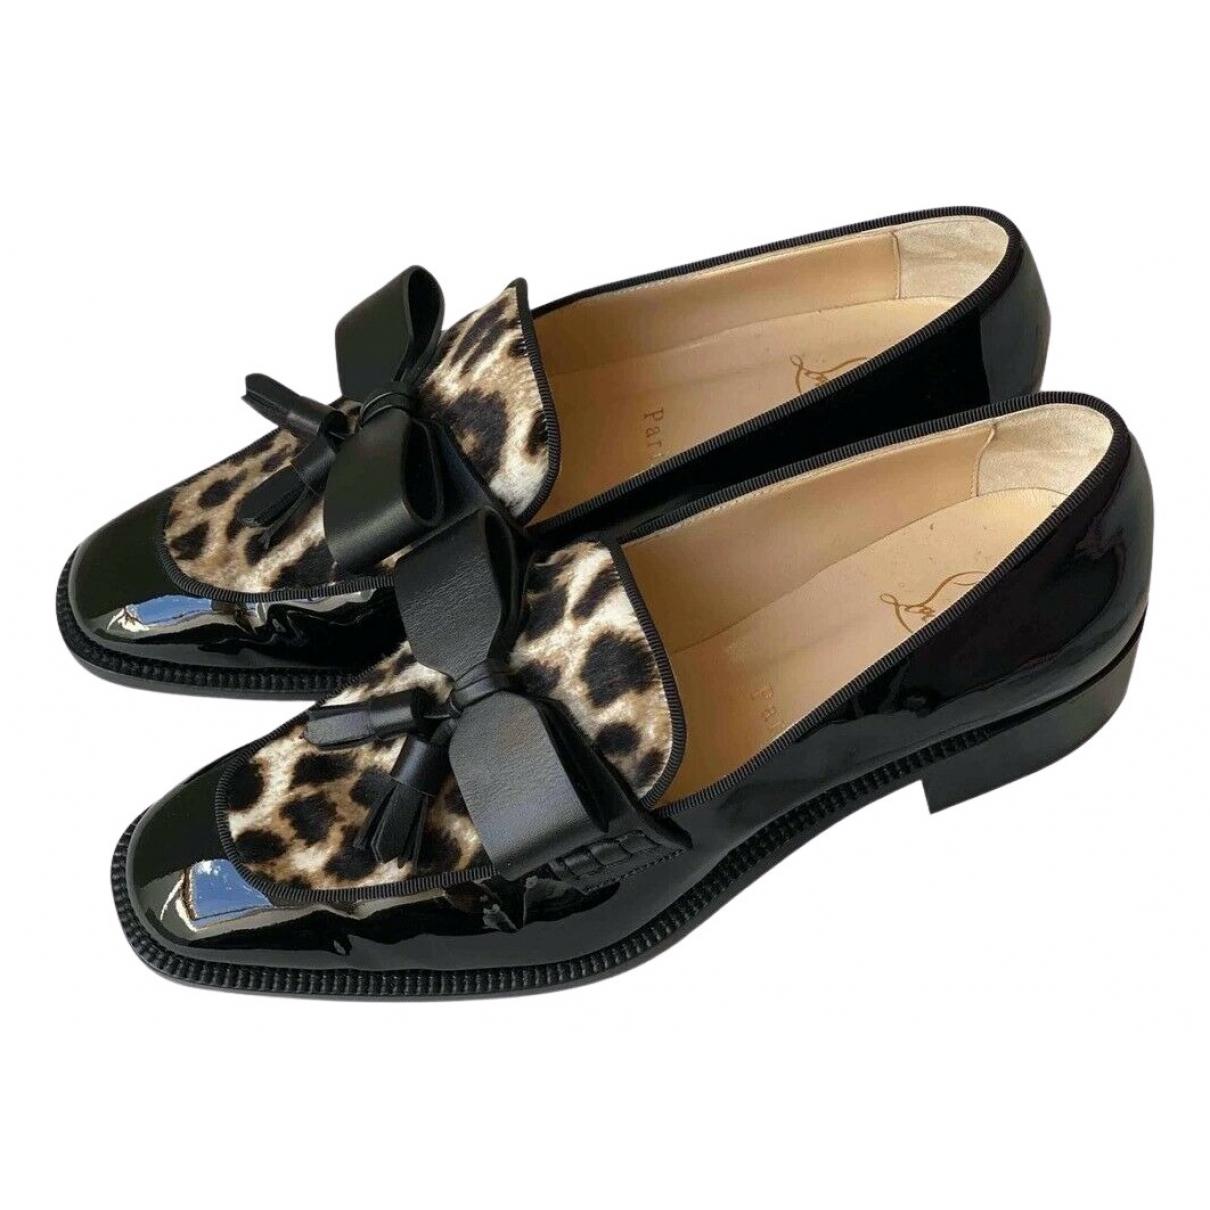 Christian Louboutin \N Black Patent leather Flats for Women 36 EU